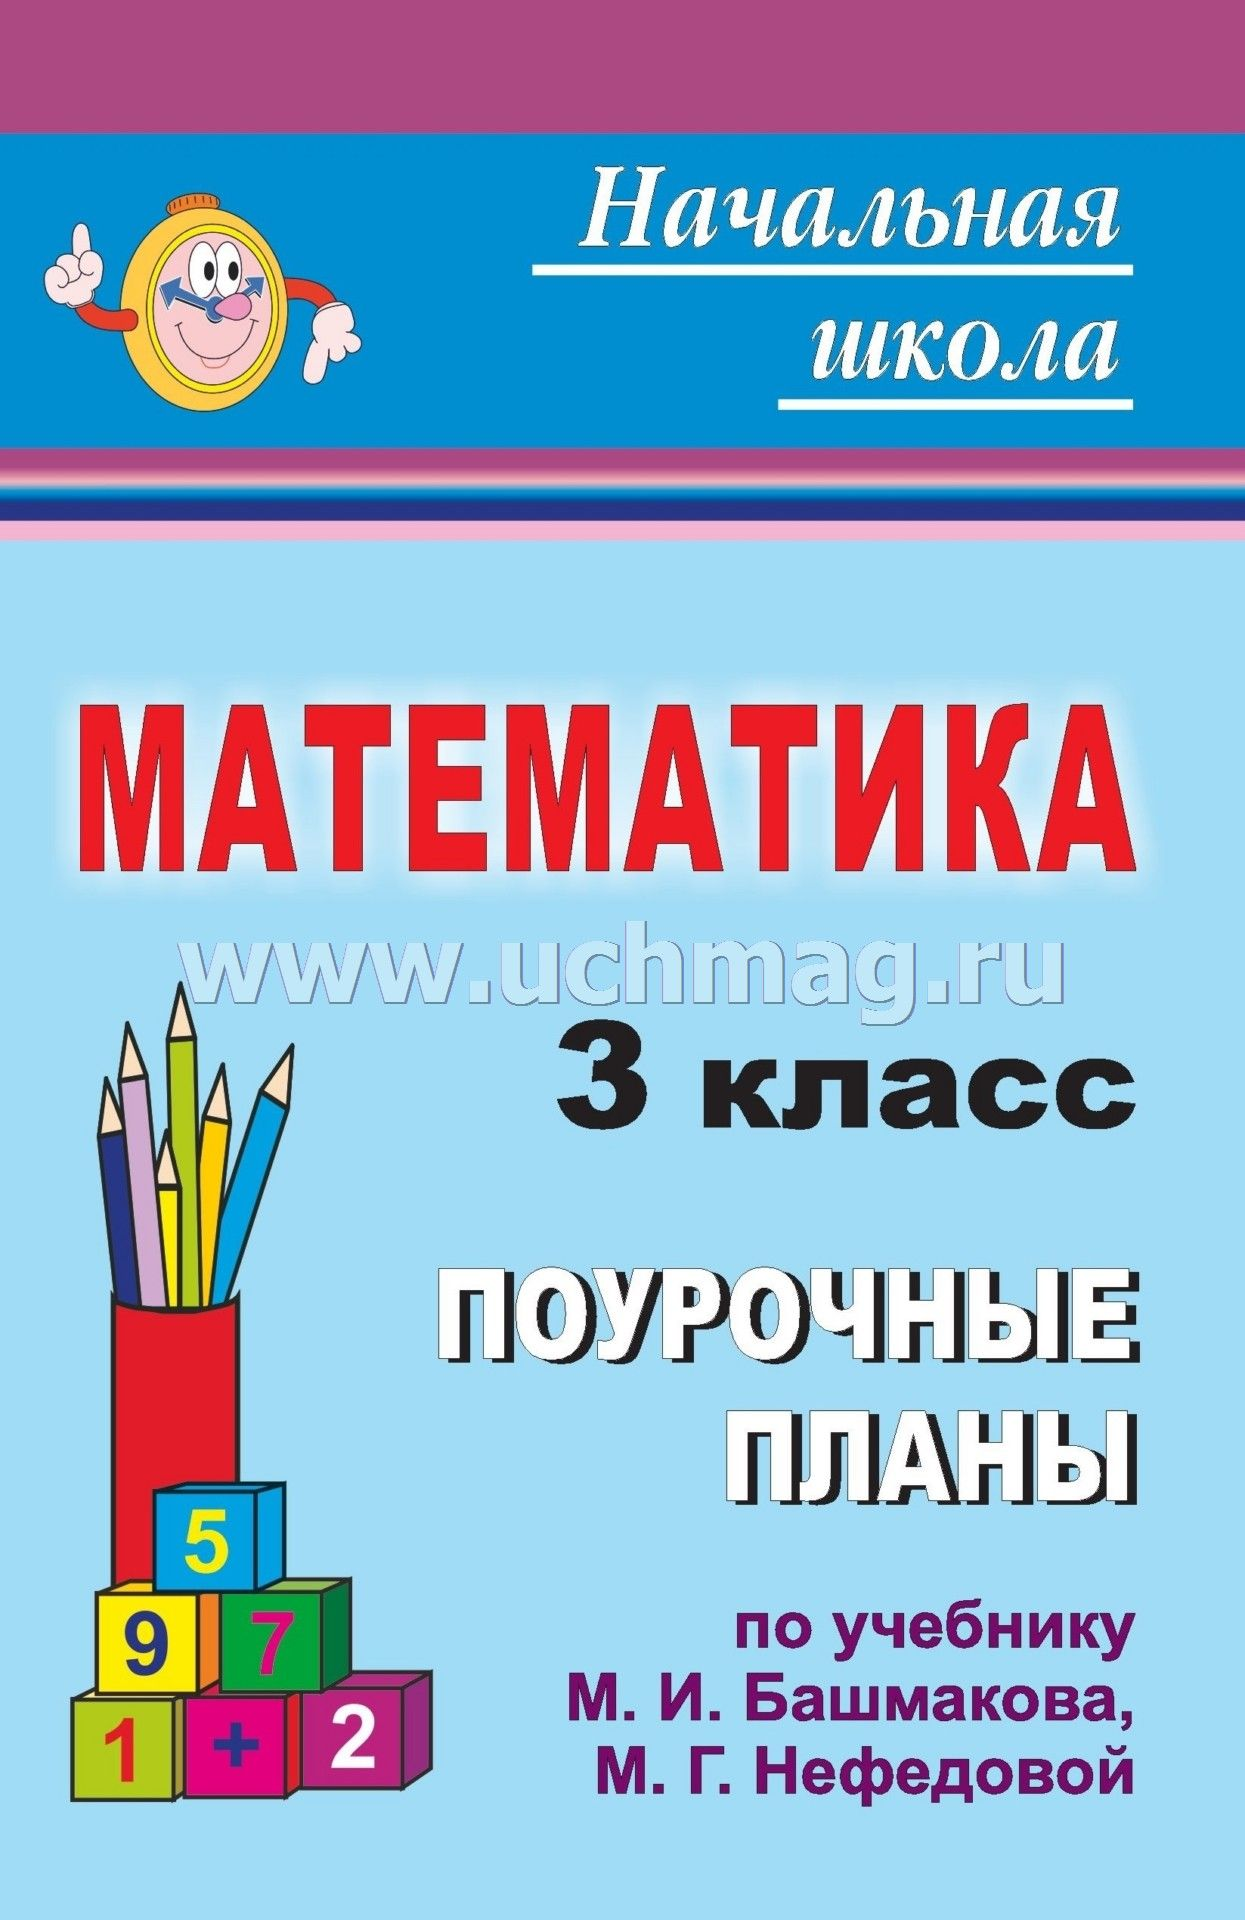 Математика 2 класс система уроков по учебнику башмакова нефедовой